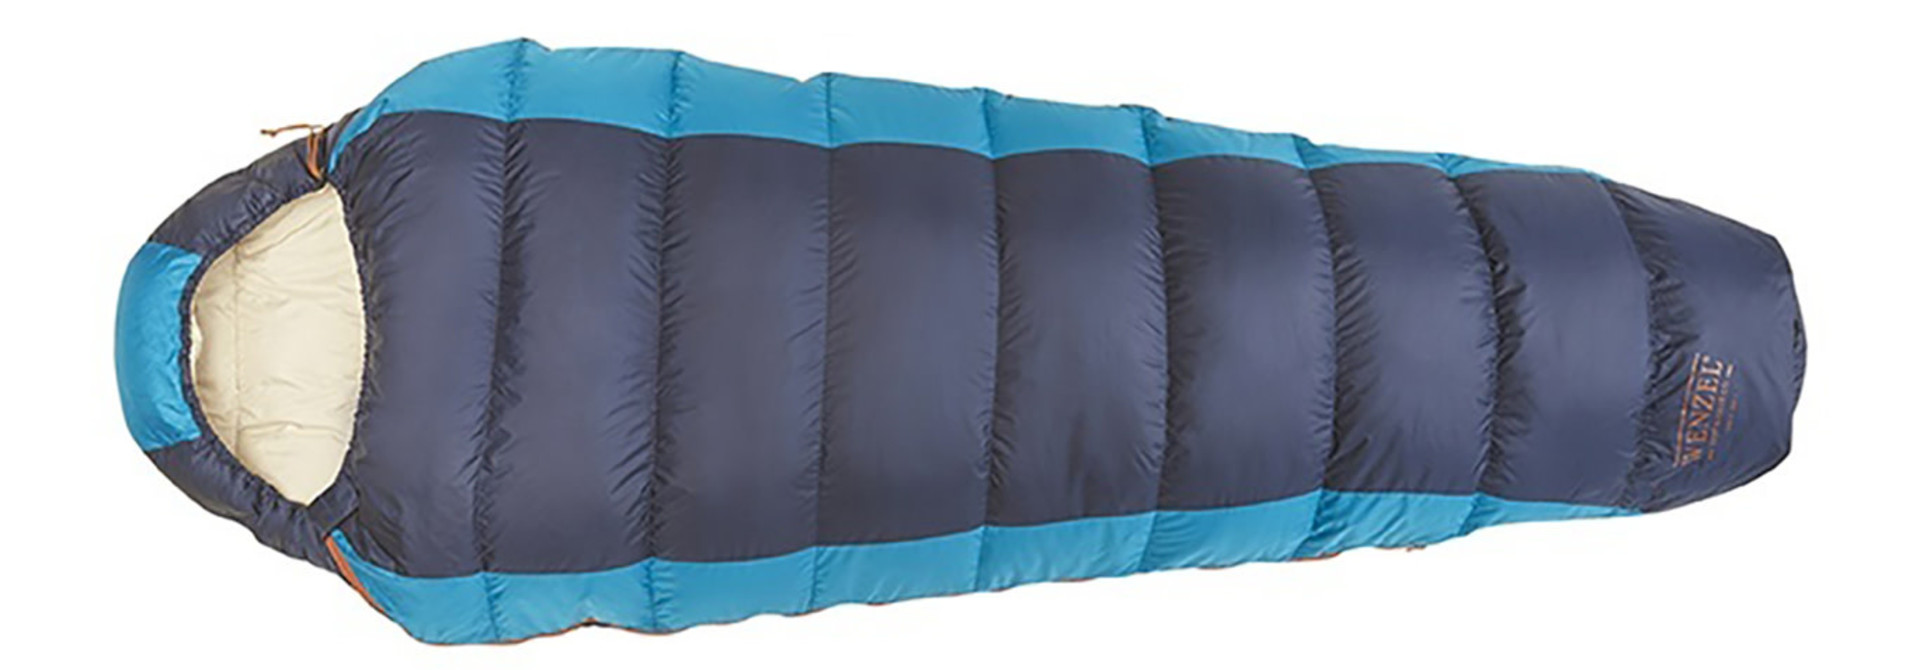 Jailbird Down Sleeping Bag 30 - 40 degree, Mummy